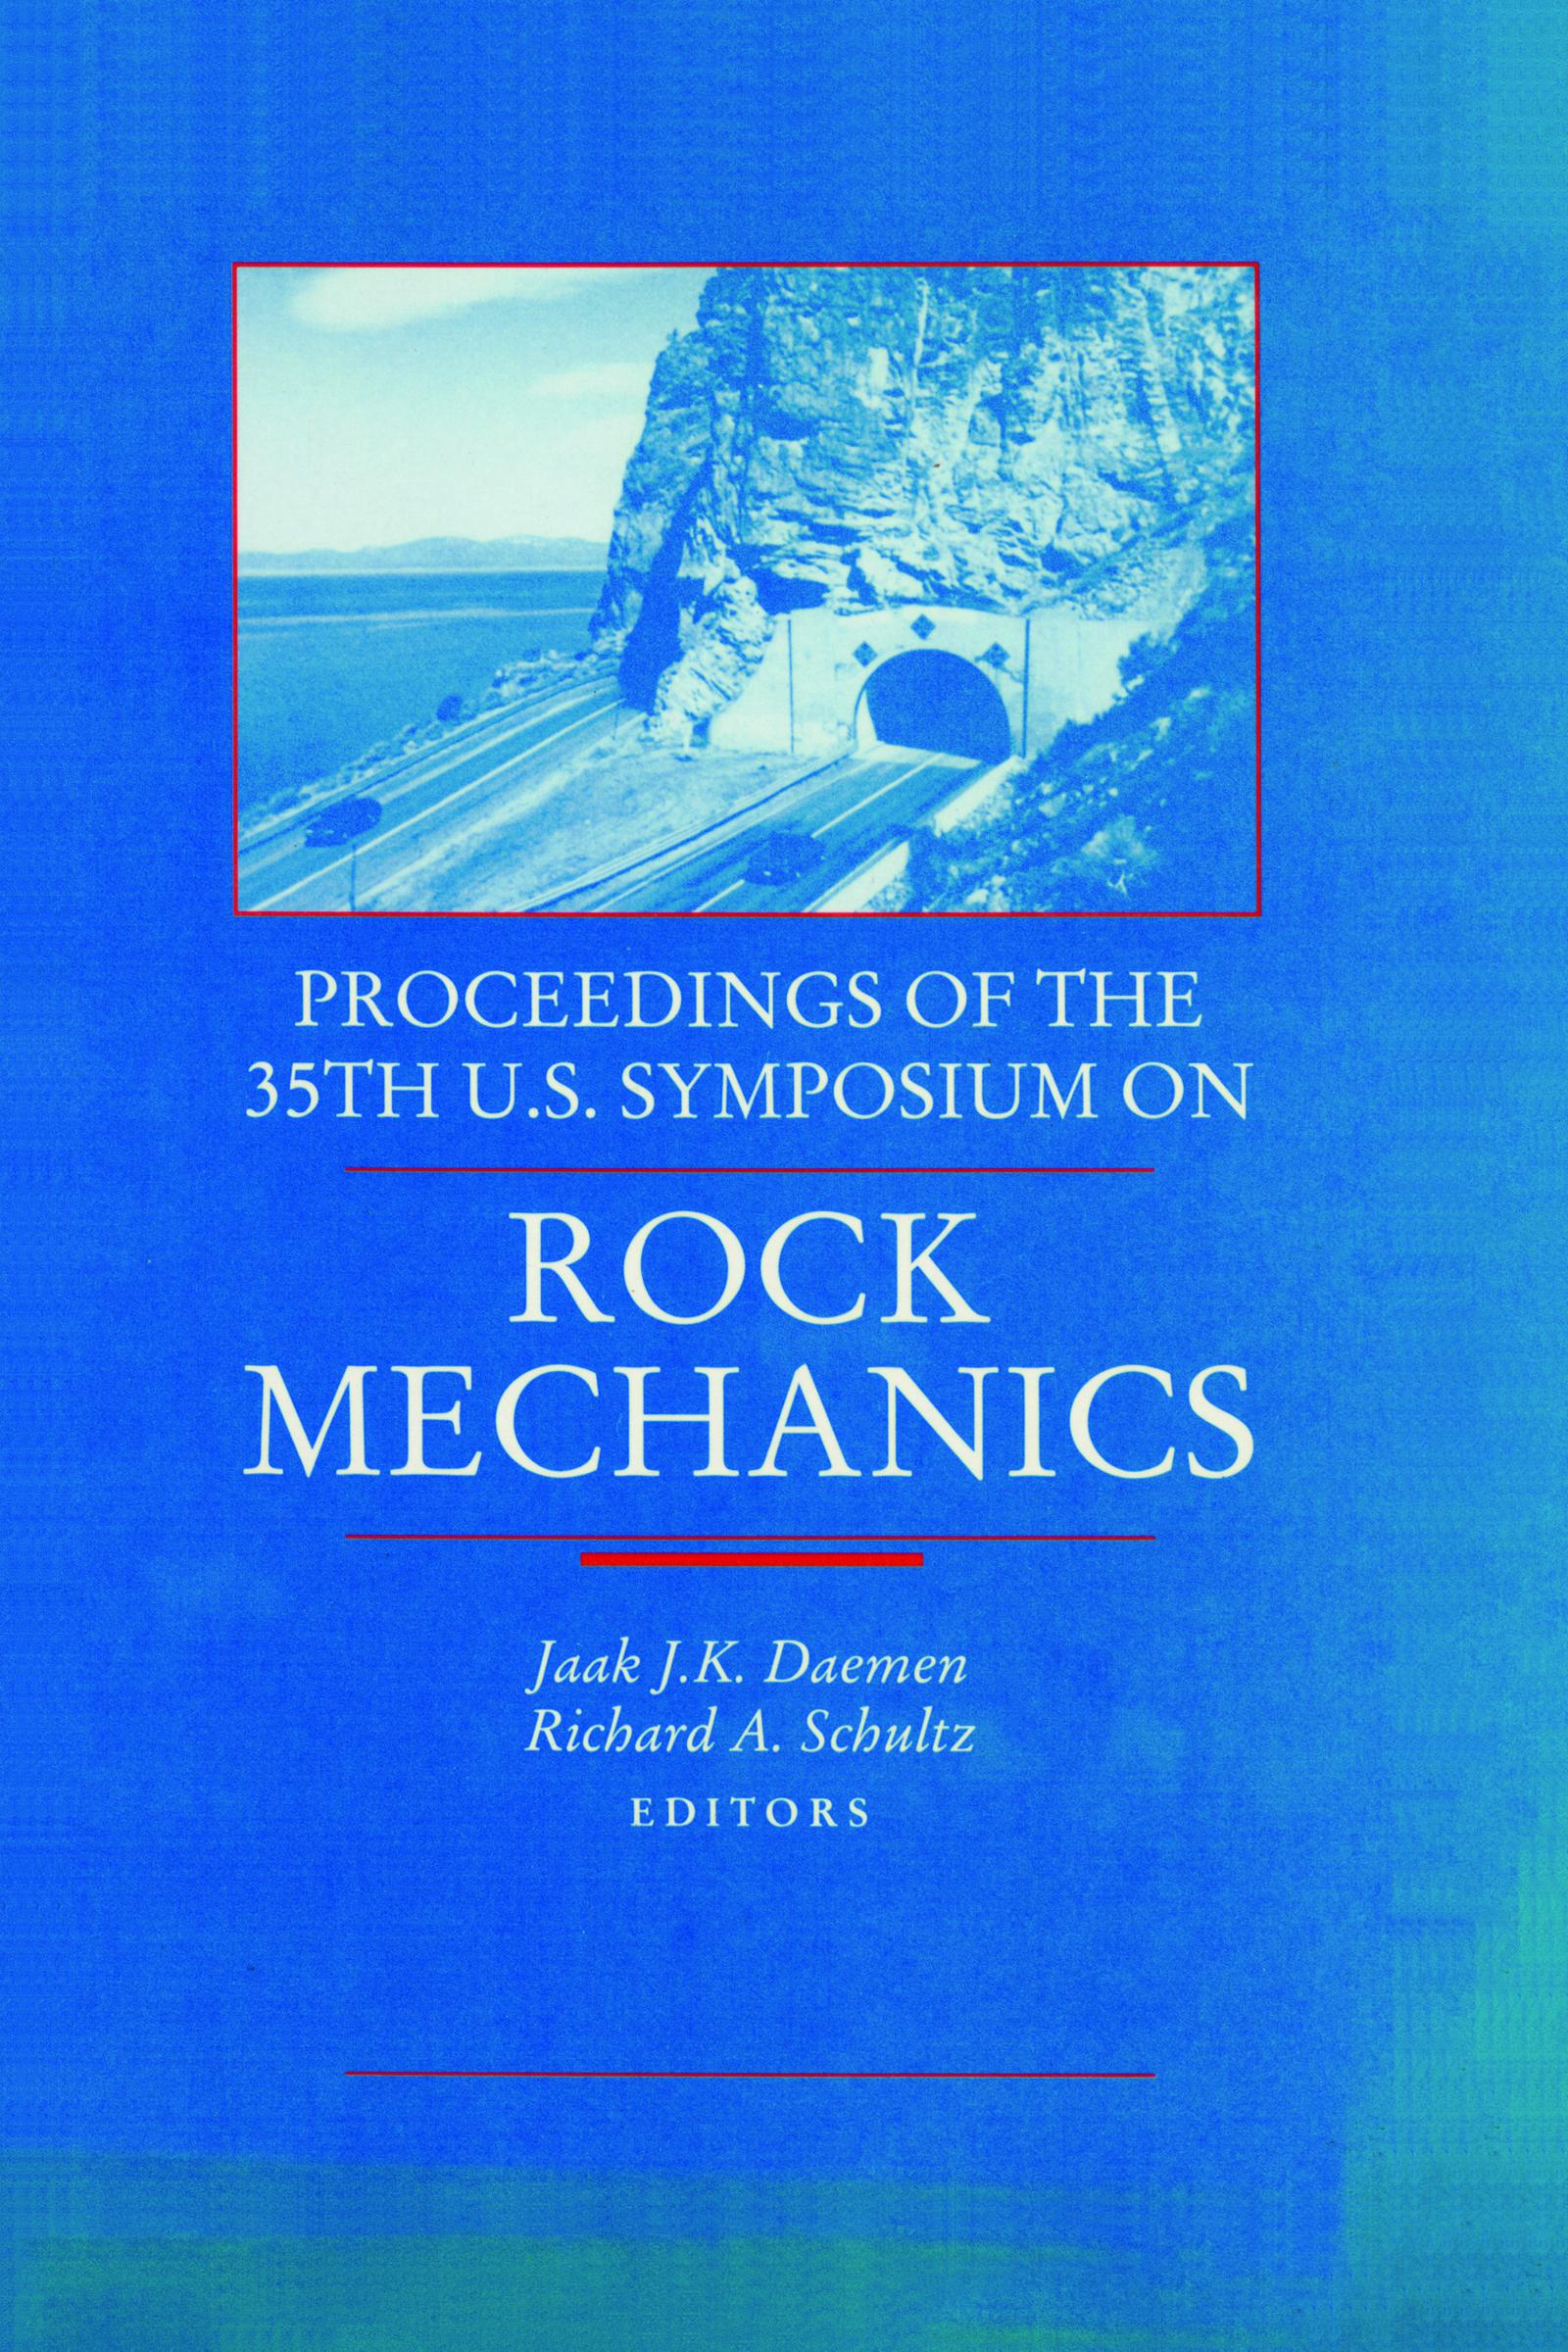 Rock Mechanics: Proceedings of the 35th US Symposium on Rock Mechanics, 1st Edition (Hardback) book cover